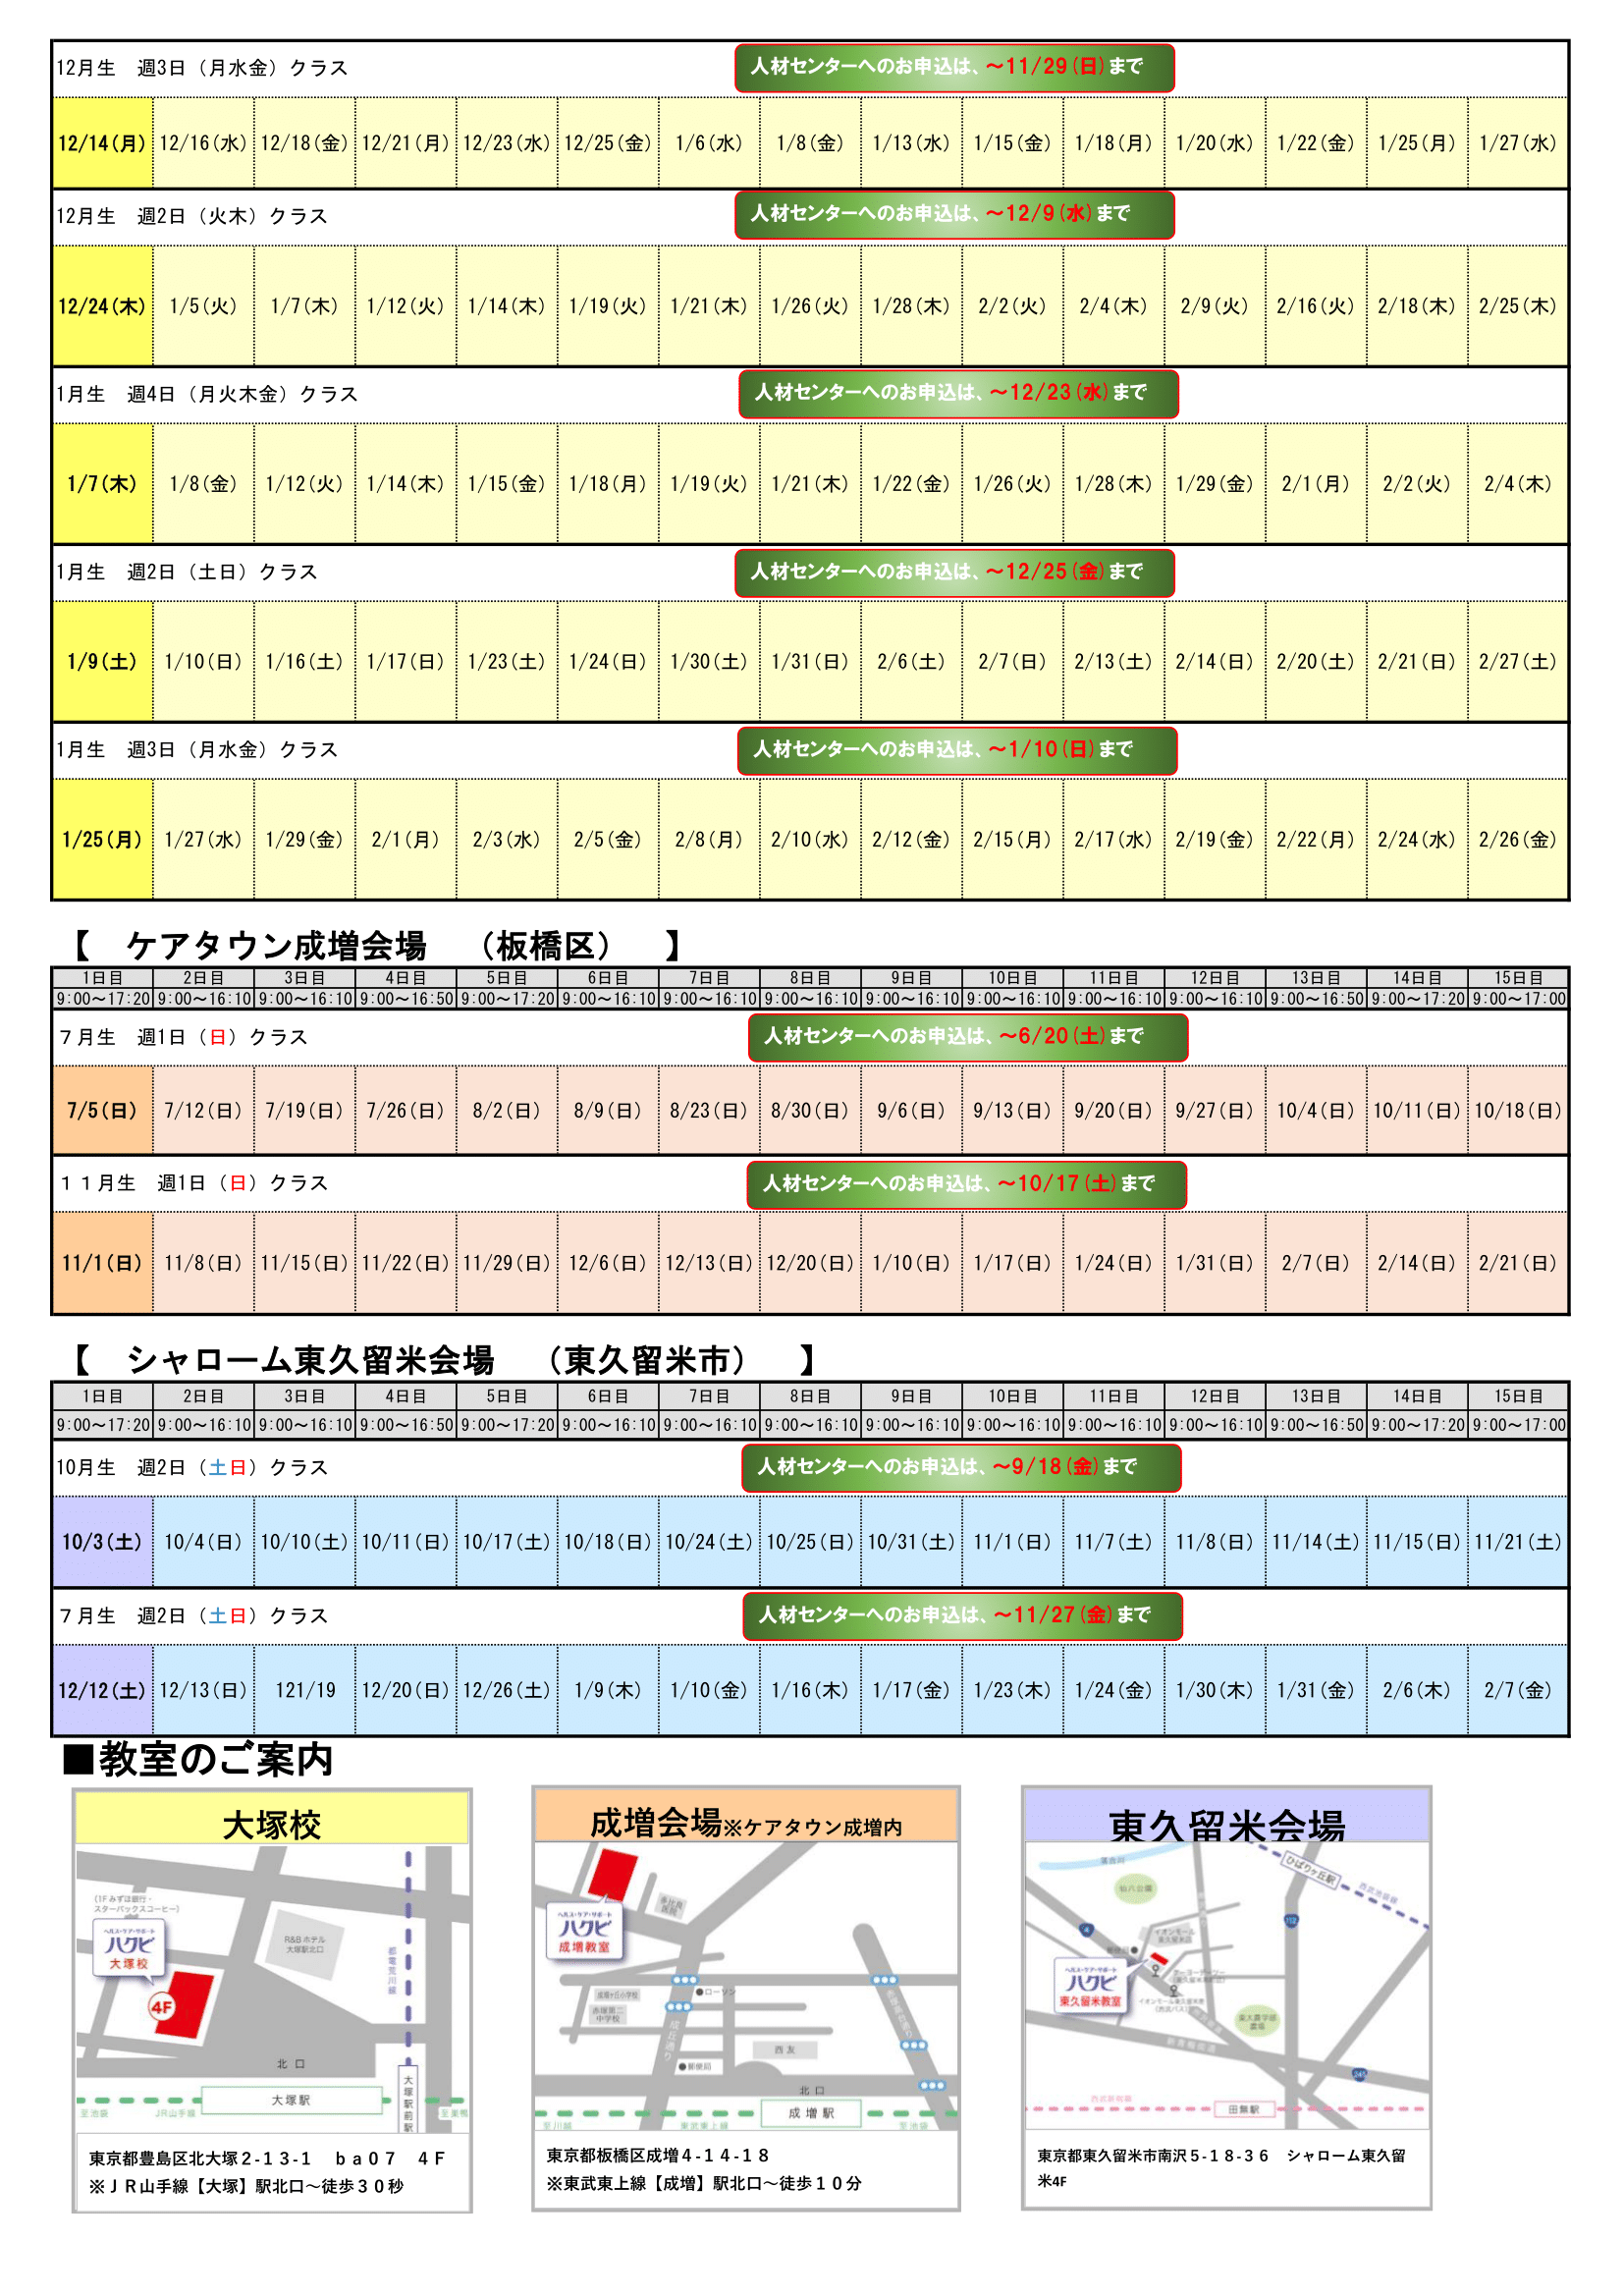 雉・シ蜿門セ玲髪謠エ2020縲€・匁椢-4